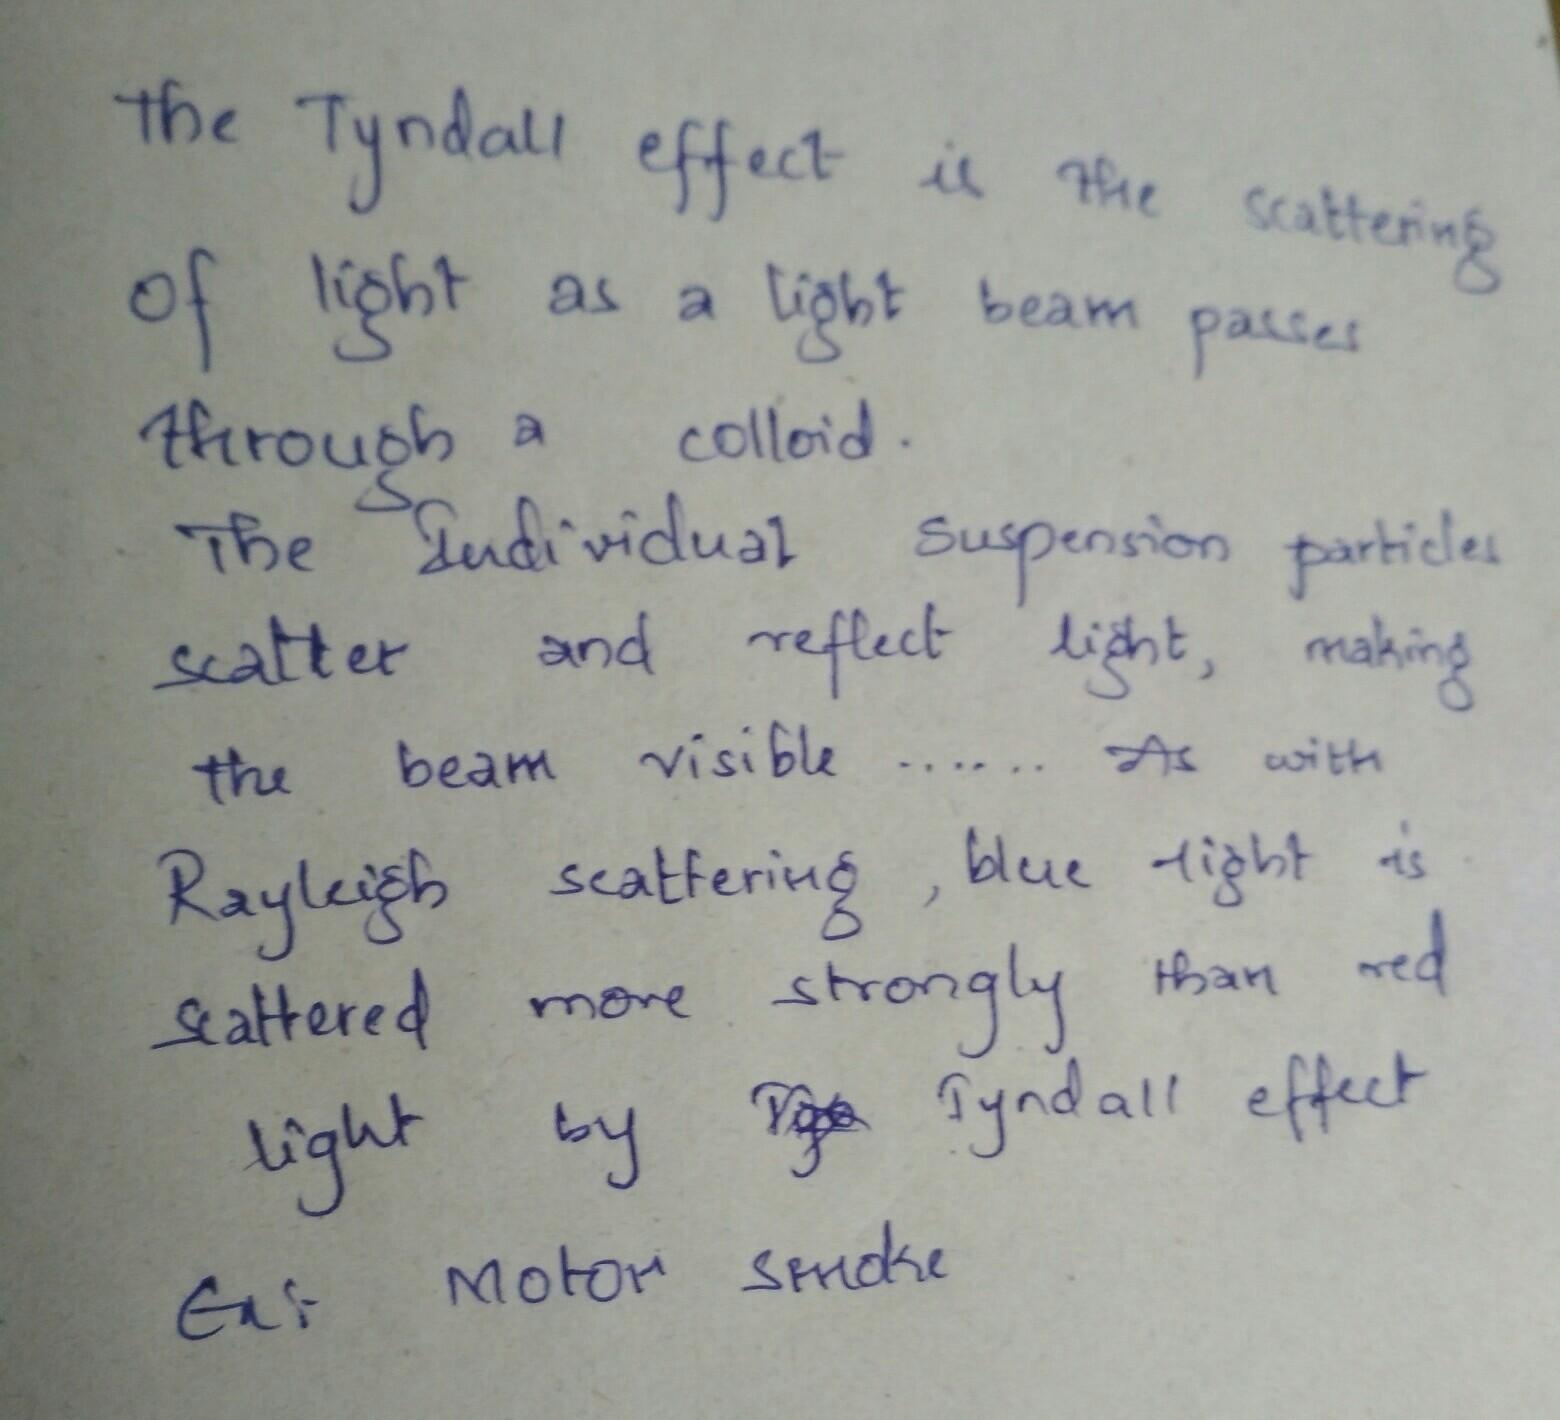 explain tyndall effect